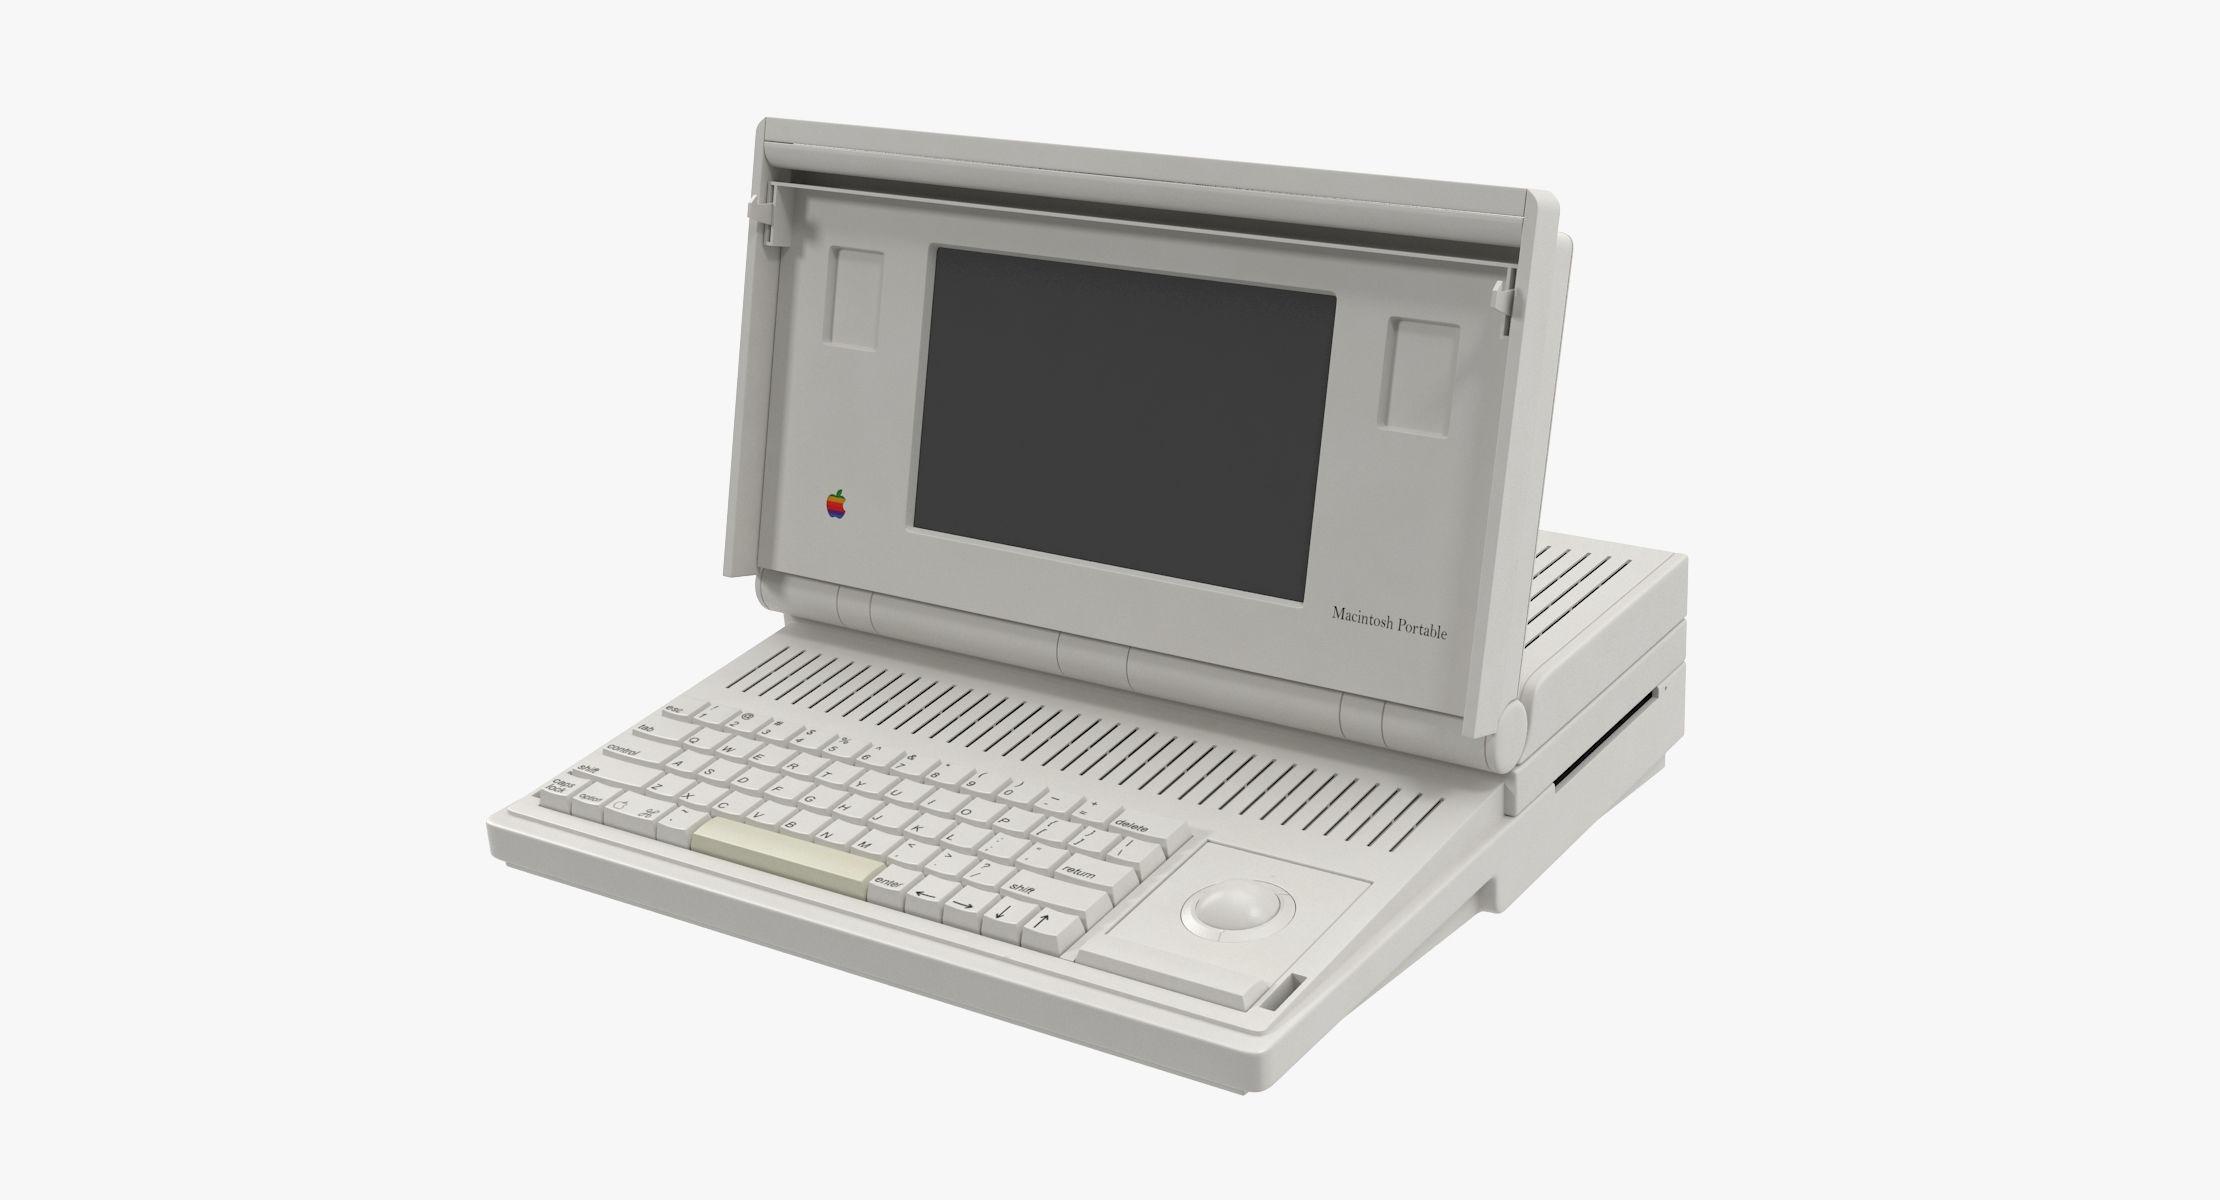 Apple Macintosh Portable - reel 1